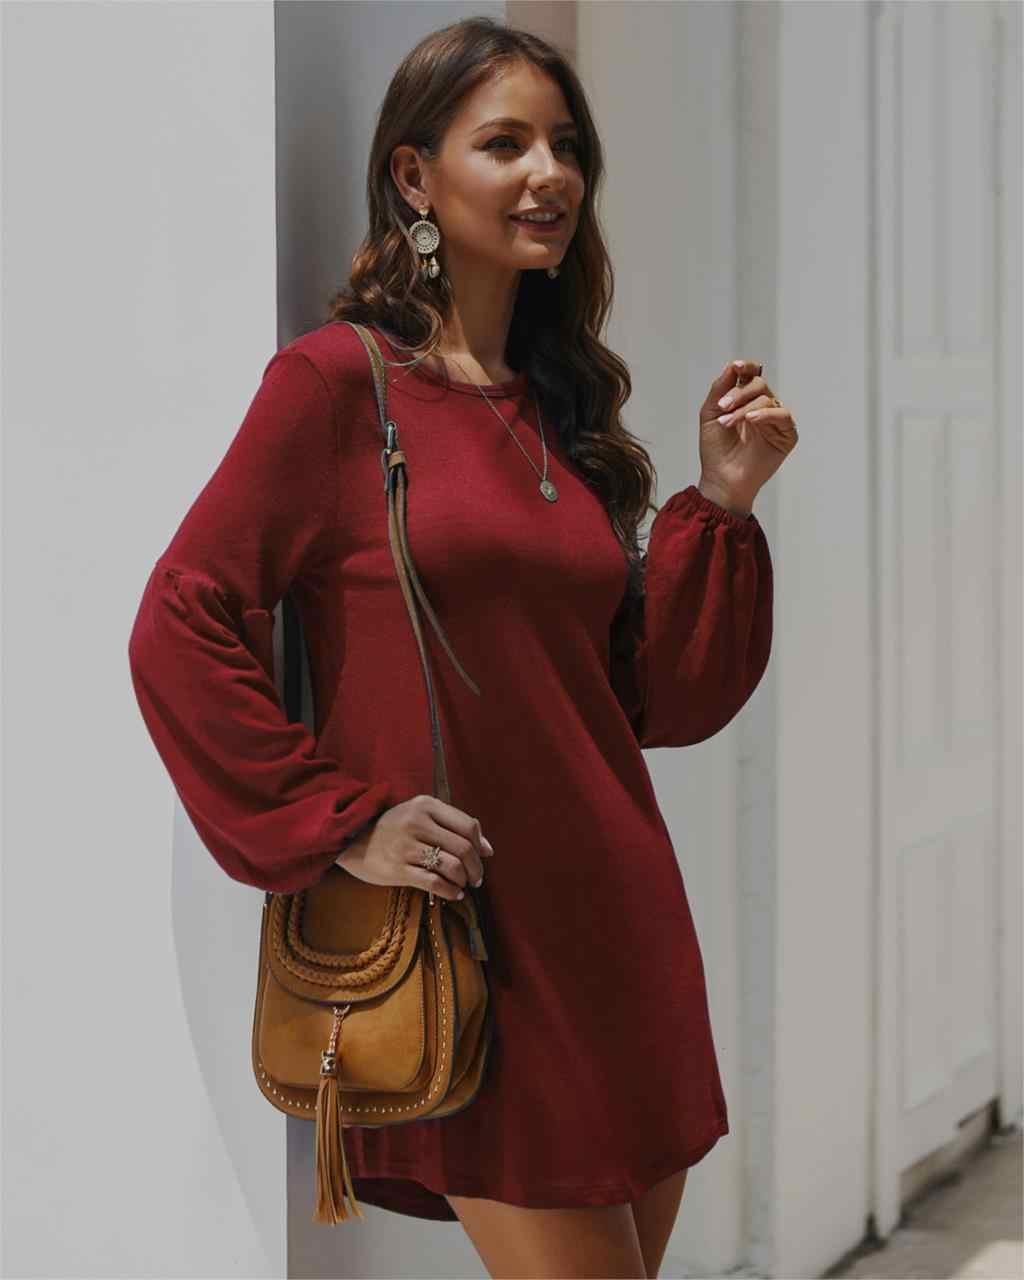 Inverno outono casual envoltório mini vestido frauen strickpullover elegante sexy feminino vintage camiseta com lanterna manga